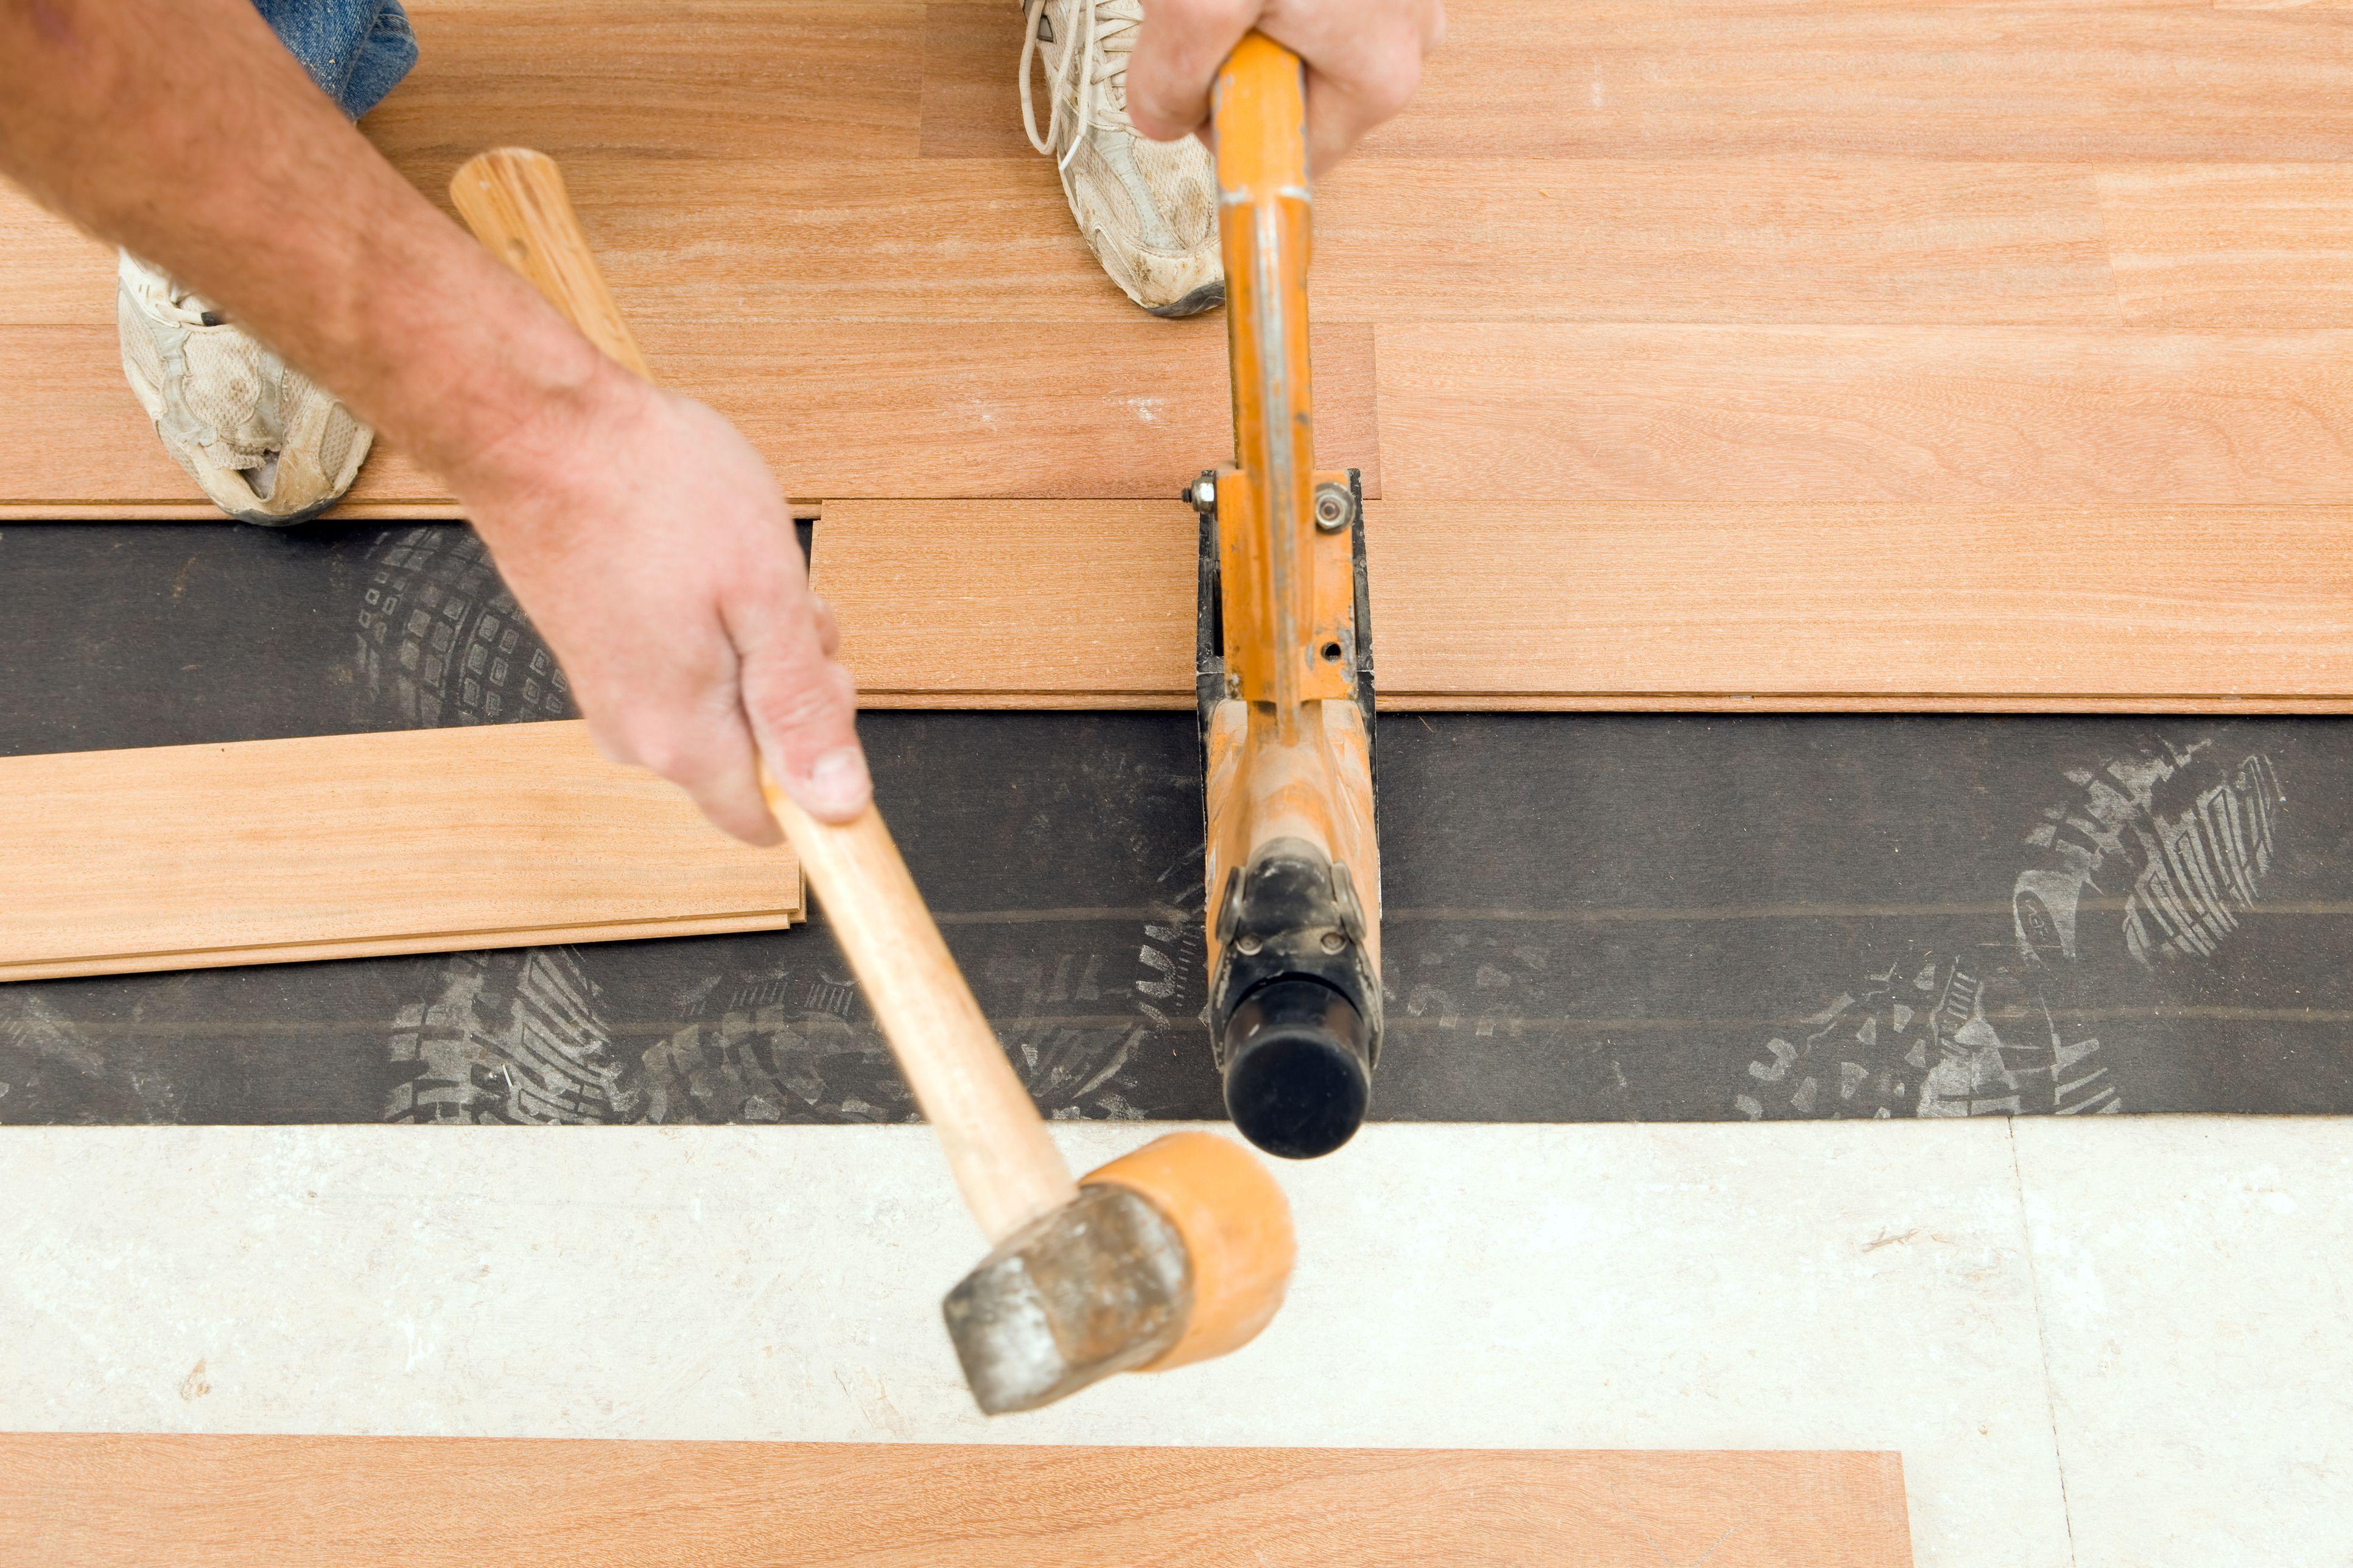 tools needed for hardwood flooring of the hardest wood flooring you can buy for worker installing new cumuru hardwood floor 186852280 5827f3bc5f9b58d5b11372fc